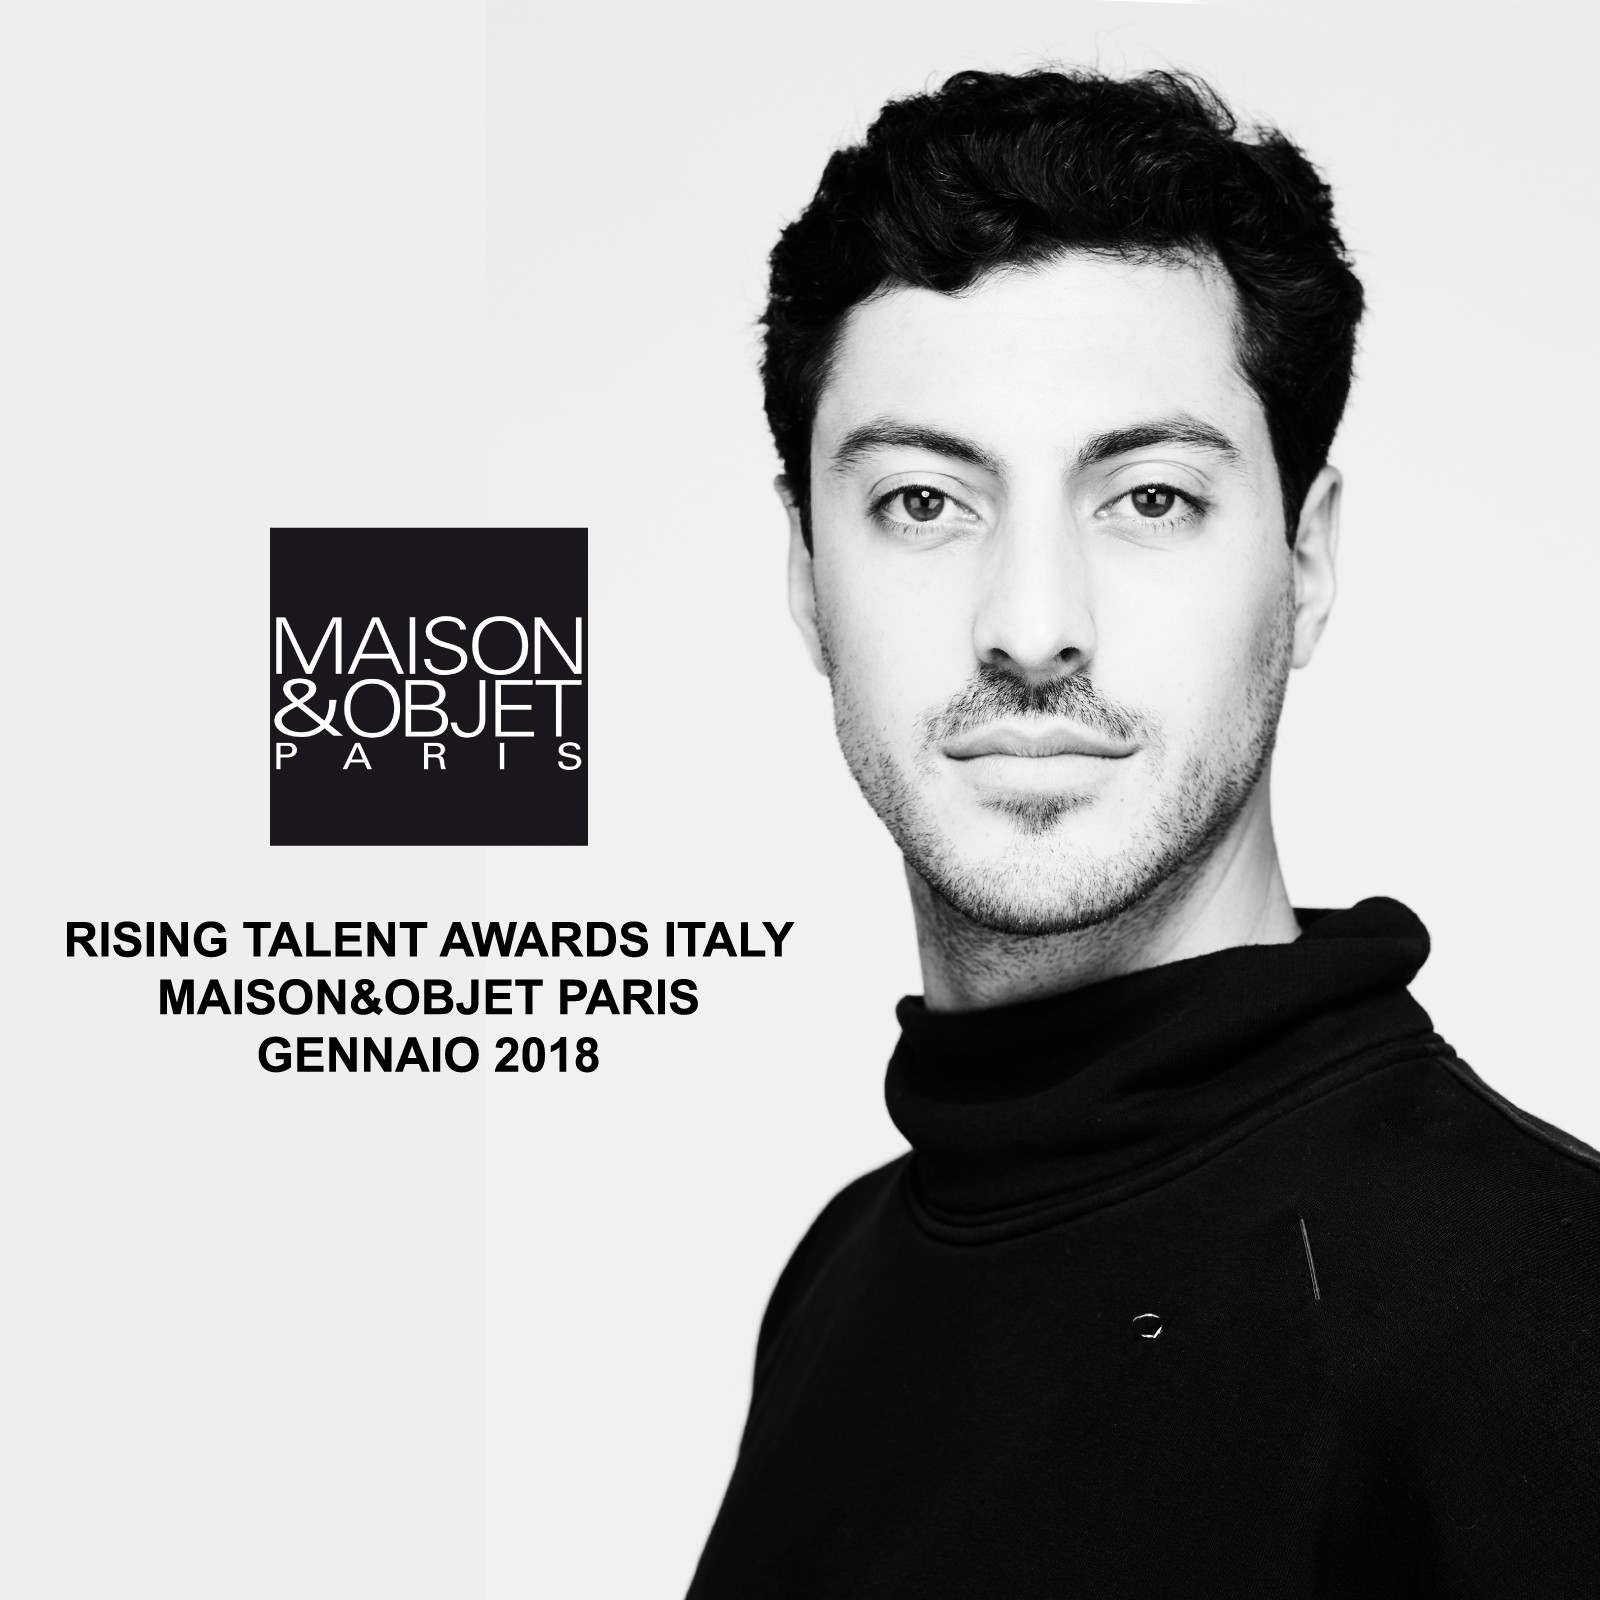 Guglielmo Poletti @ Rising Talent Awards Italy Maison&Objet Paris January 2018